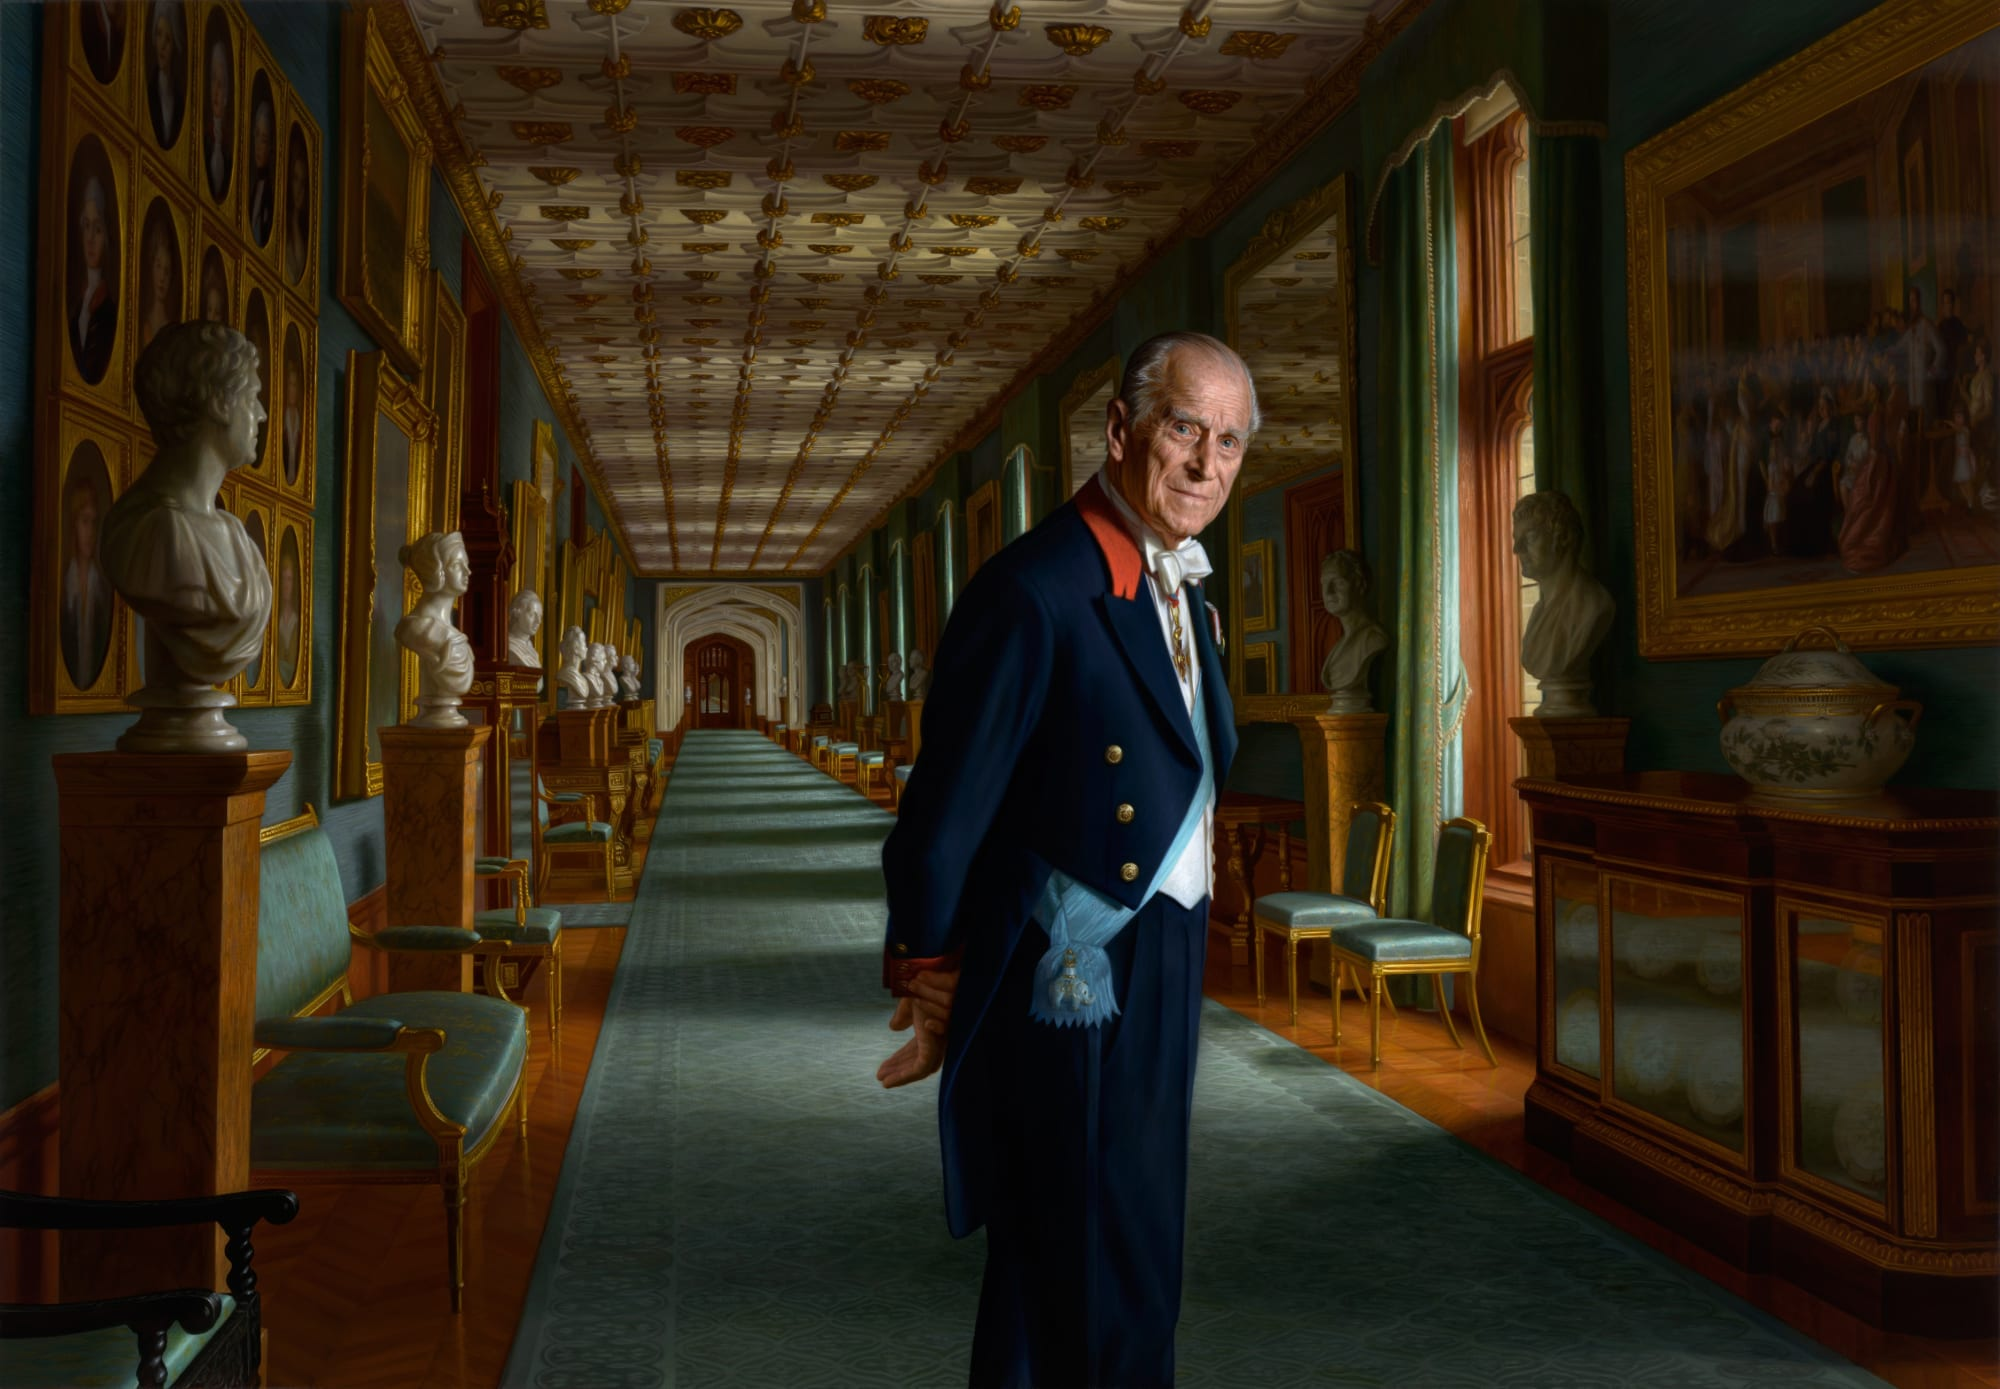 Portrait of HRH The Duke of Edinburgh | RALPH HEIMANS